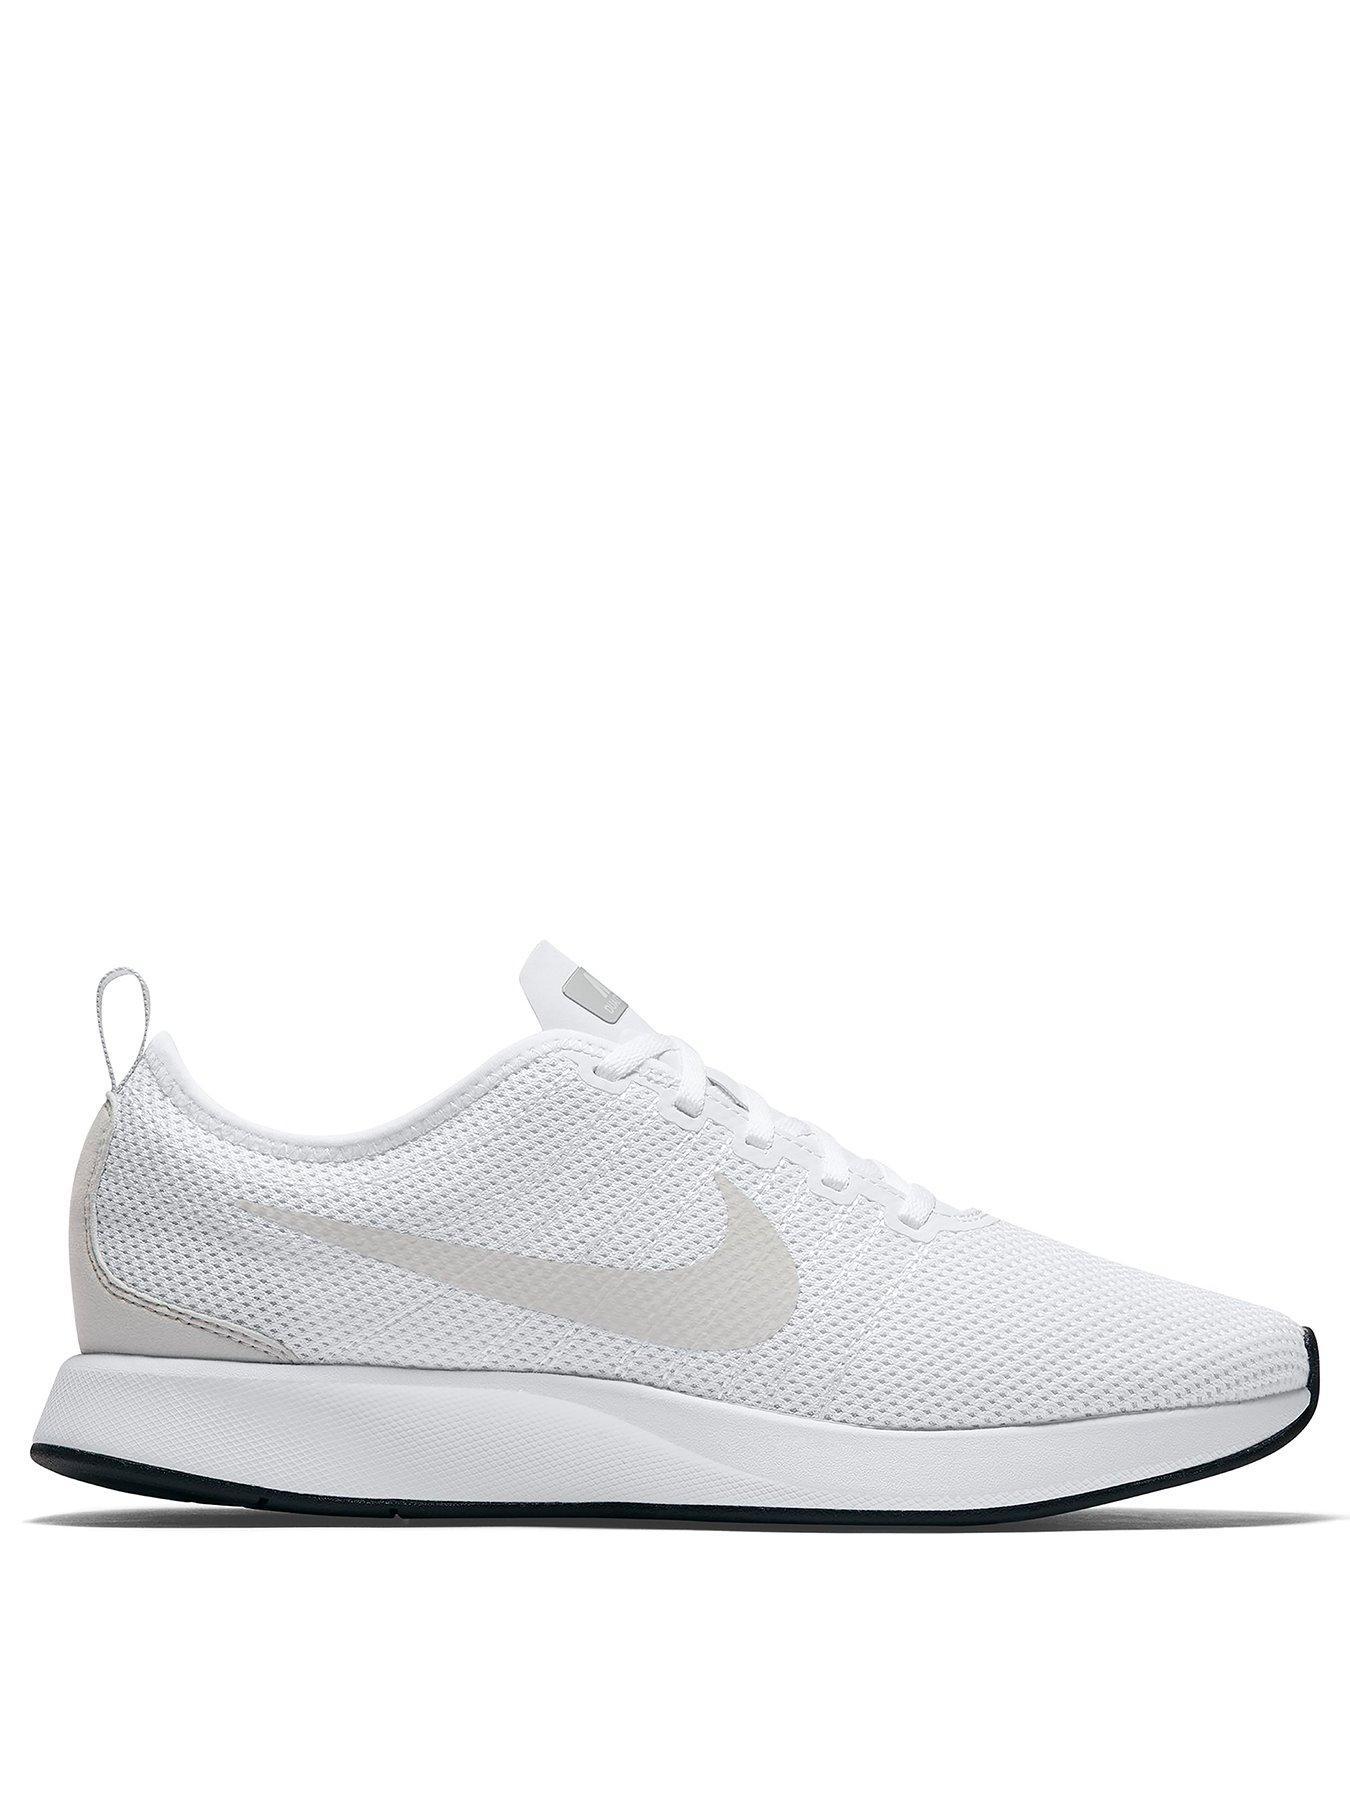 Nike Dualtone Racer - White